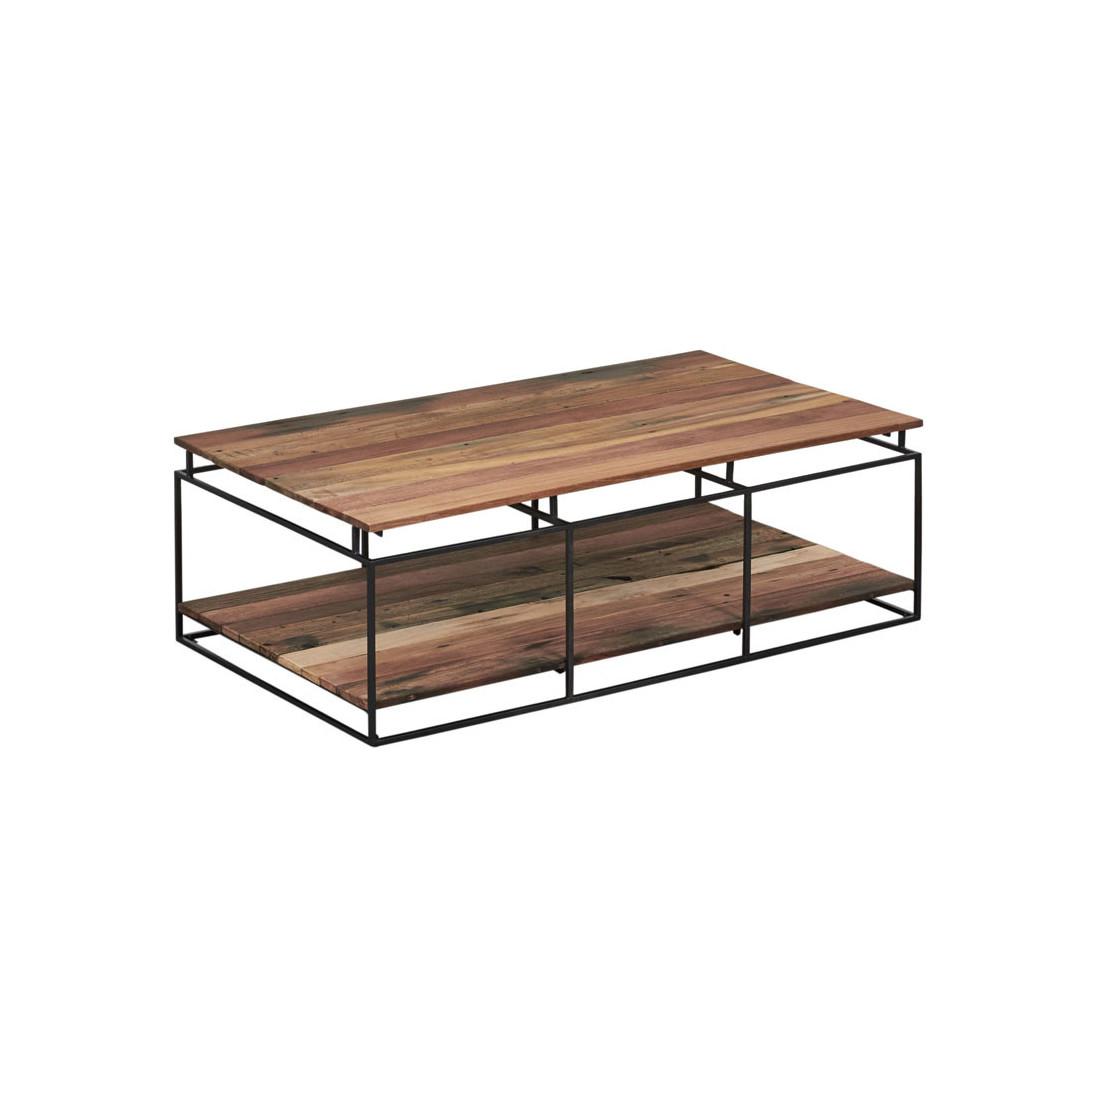 Table basse rectangulaire fer bois double plateau phoenix Table basse bois rectangulaire